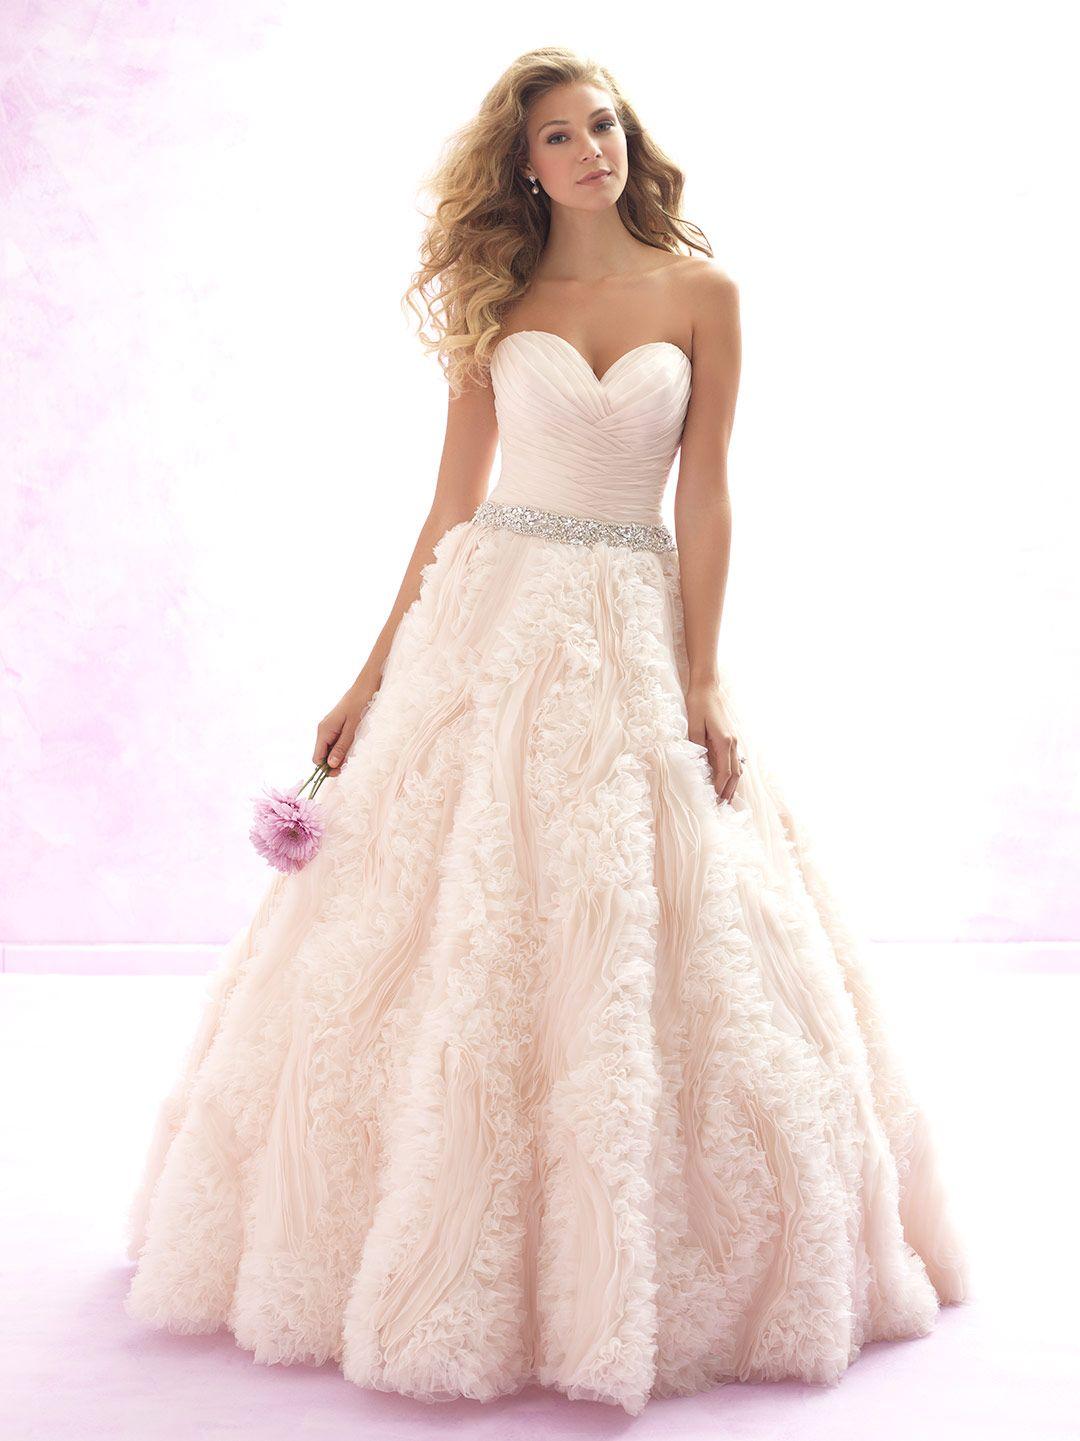 Style Mj120 Allurebridals Usabridal Bridalwarehouse